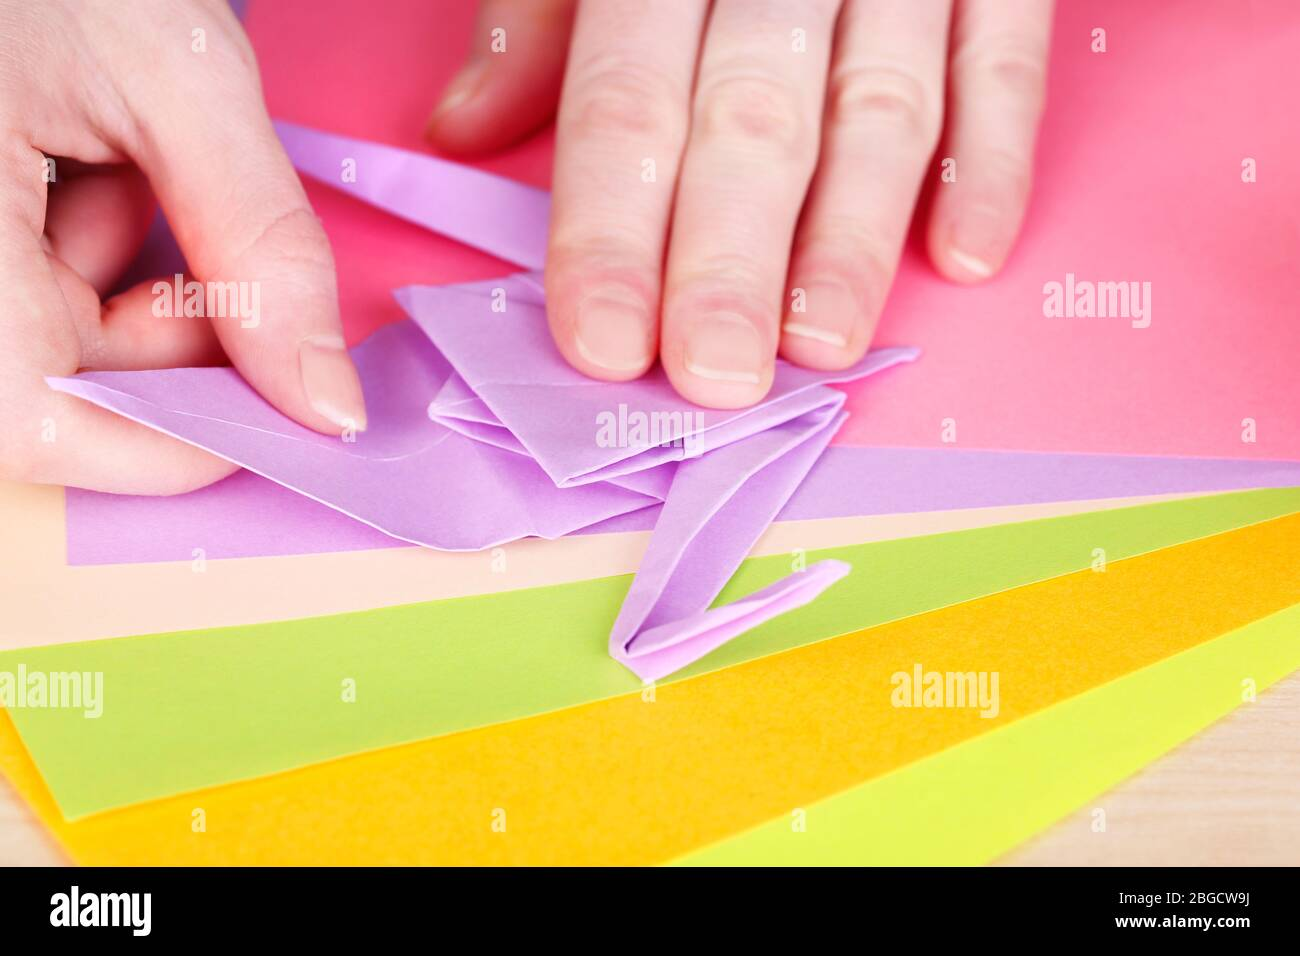 How to make a Paper Crane | Origami Crane (Folding Instructions ... | 956x1300